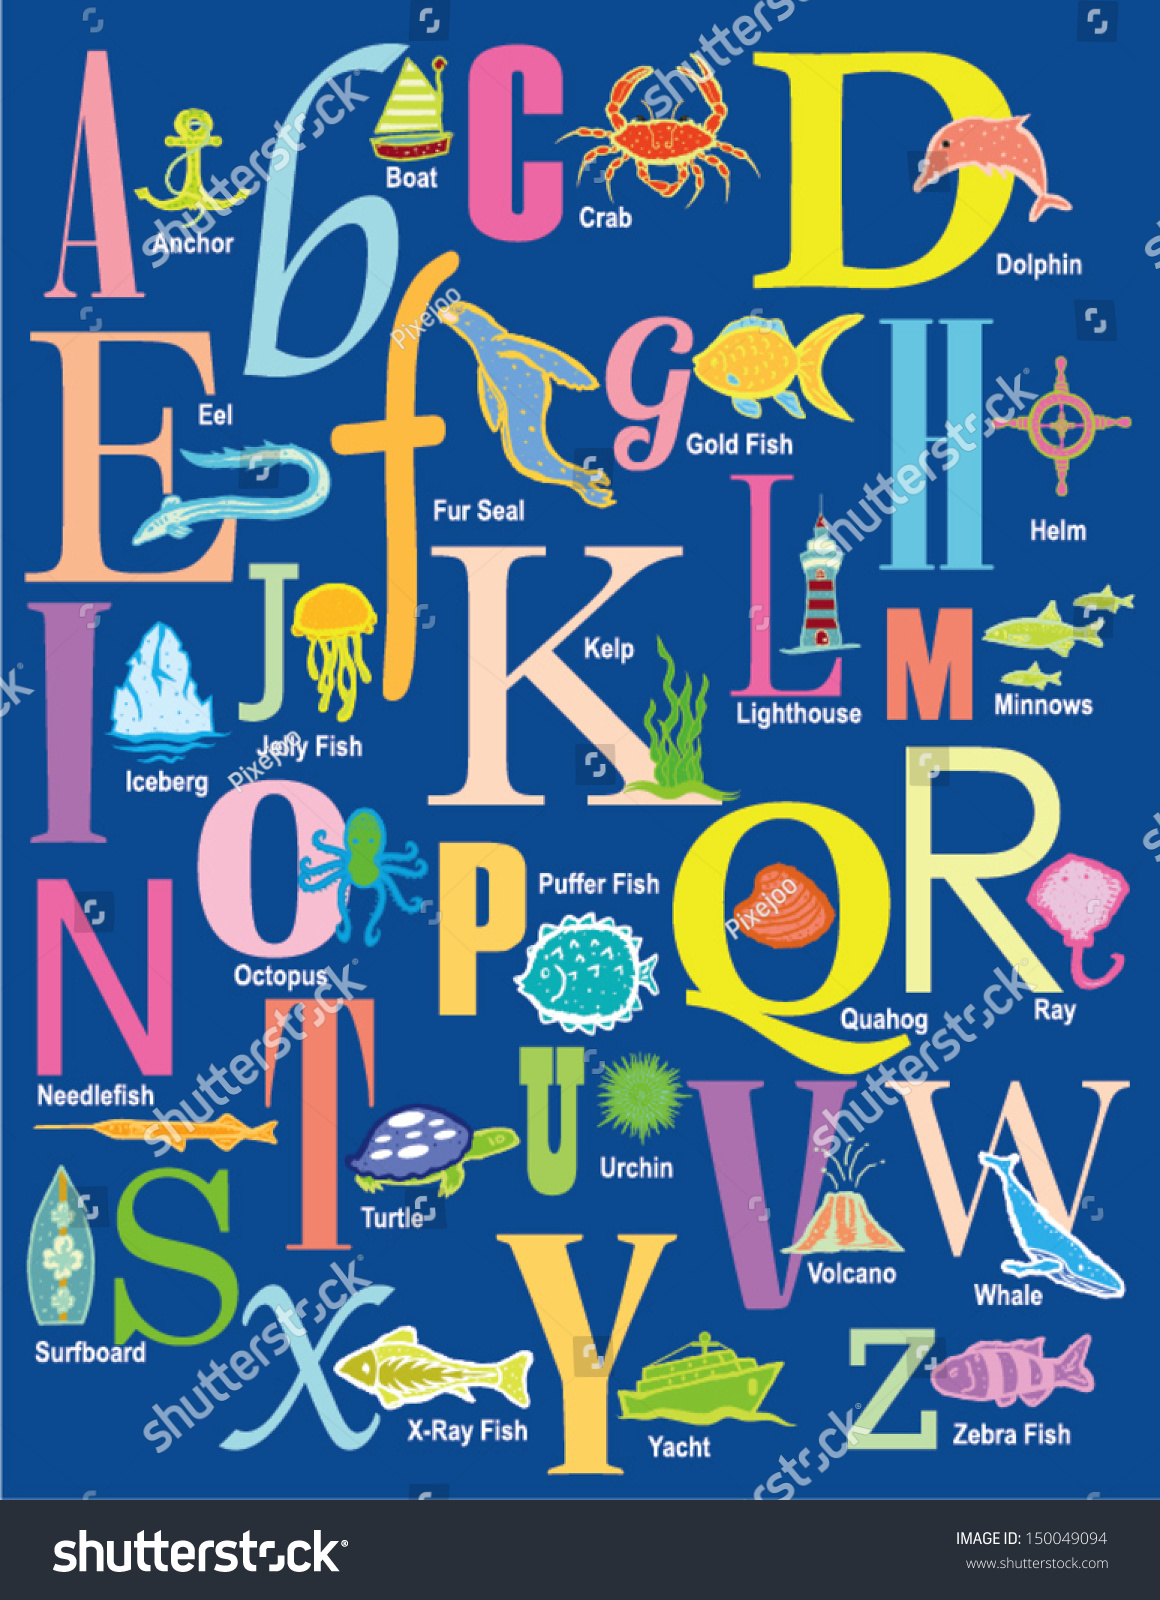 Ocean Alphabet Theme Design With Letters And Descriptions